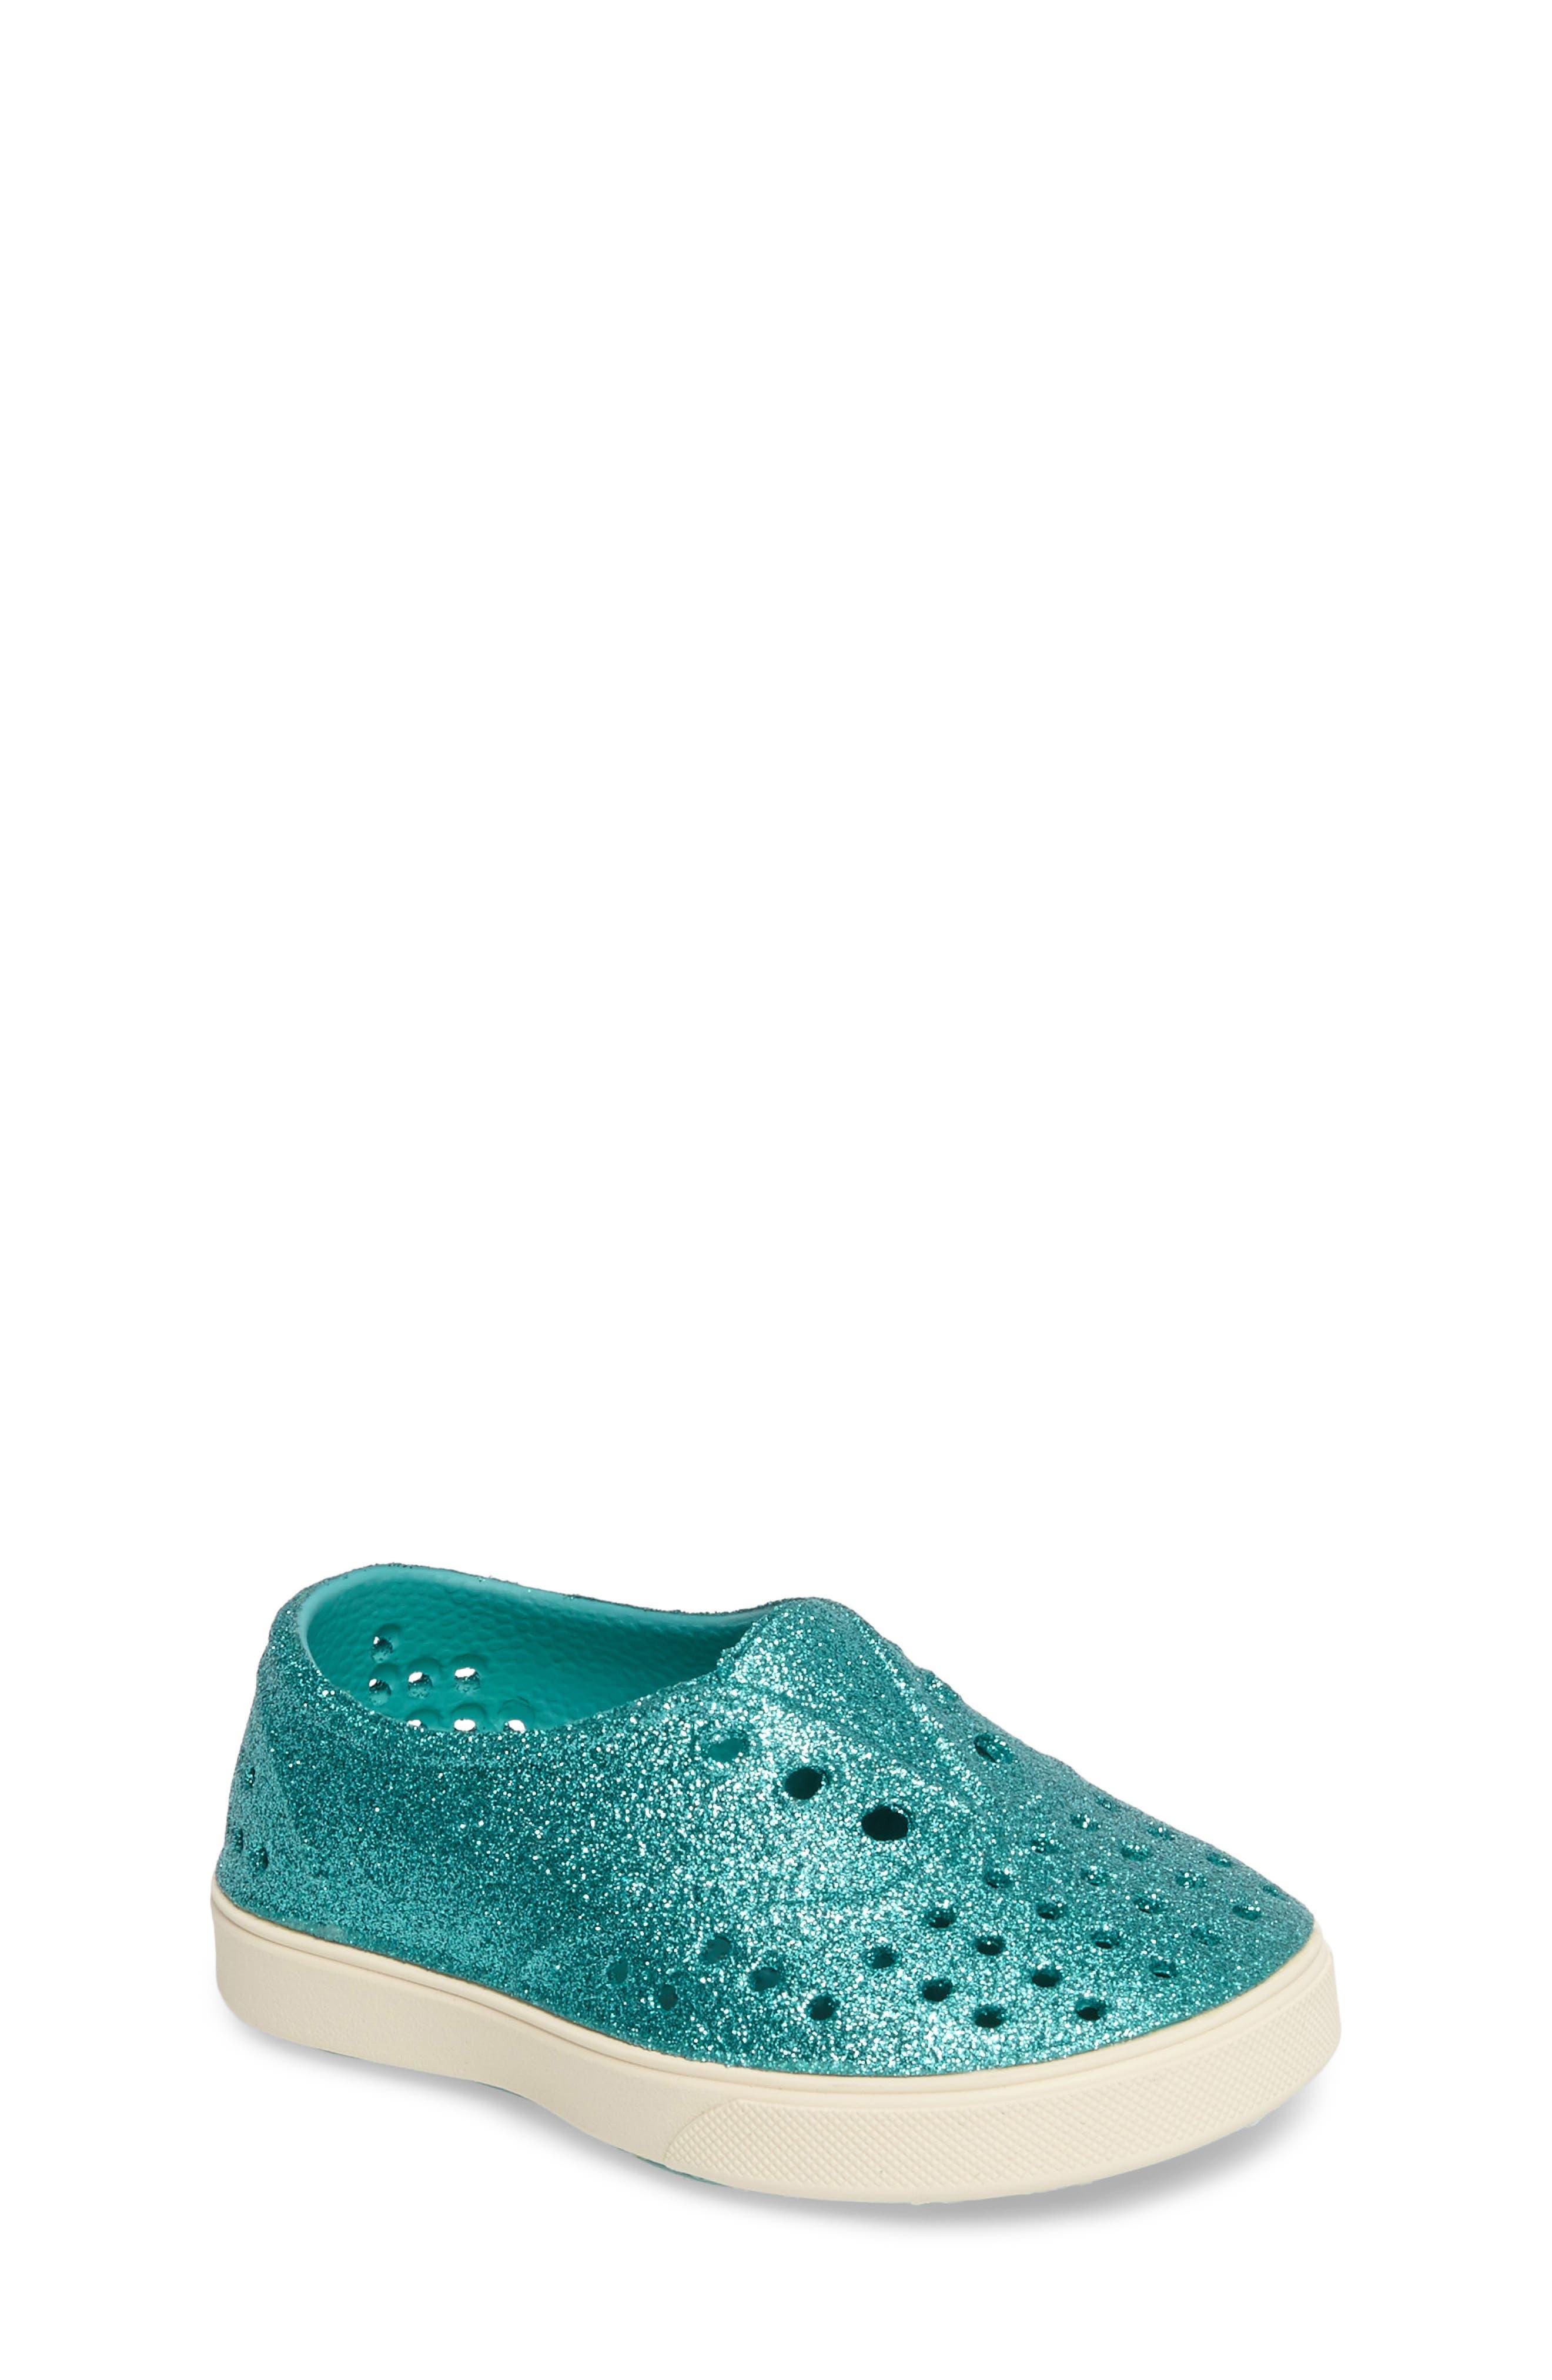 Main Image - Native Shoes Miller Sparkly Perforated Slip-On (Walker, Toddler & Little Kid)